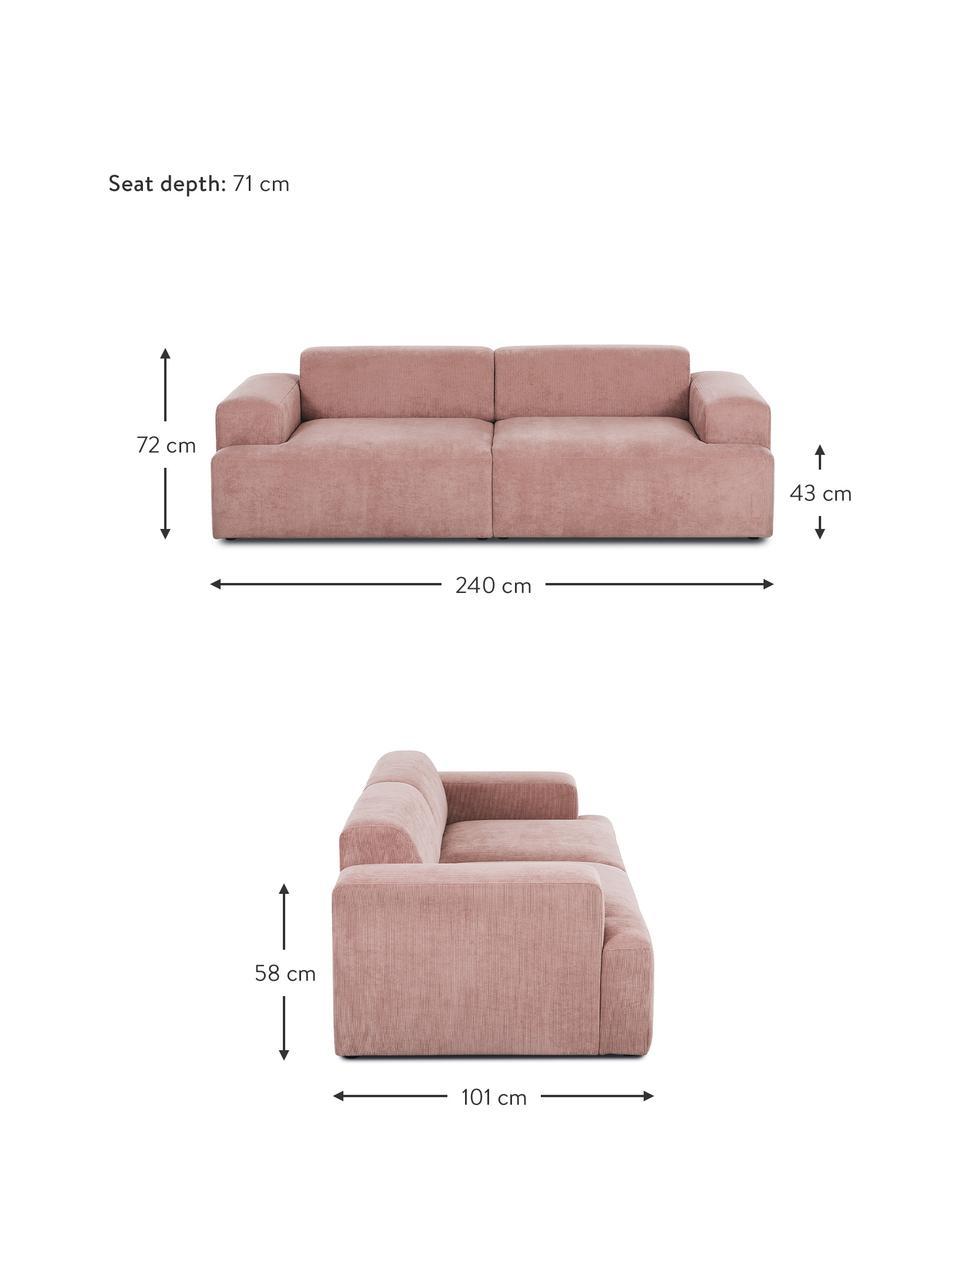 Cord-Sofa Melva (3-Sitzer) in Rosa, Bezug: Cord (92% Polyester, 8% P, Gestell: Massives Kiefernholz, Spa, Füße: Kiefernholz Die Füße befi, Cord Rosa, B 240 x T 101 cm